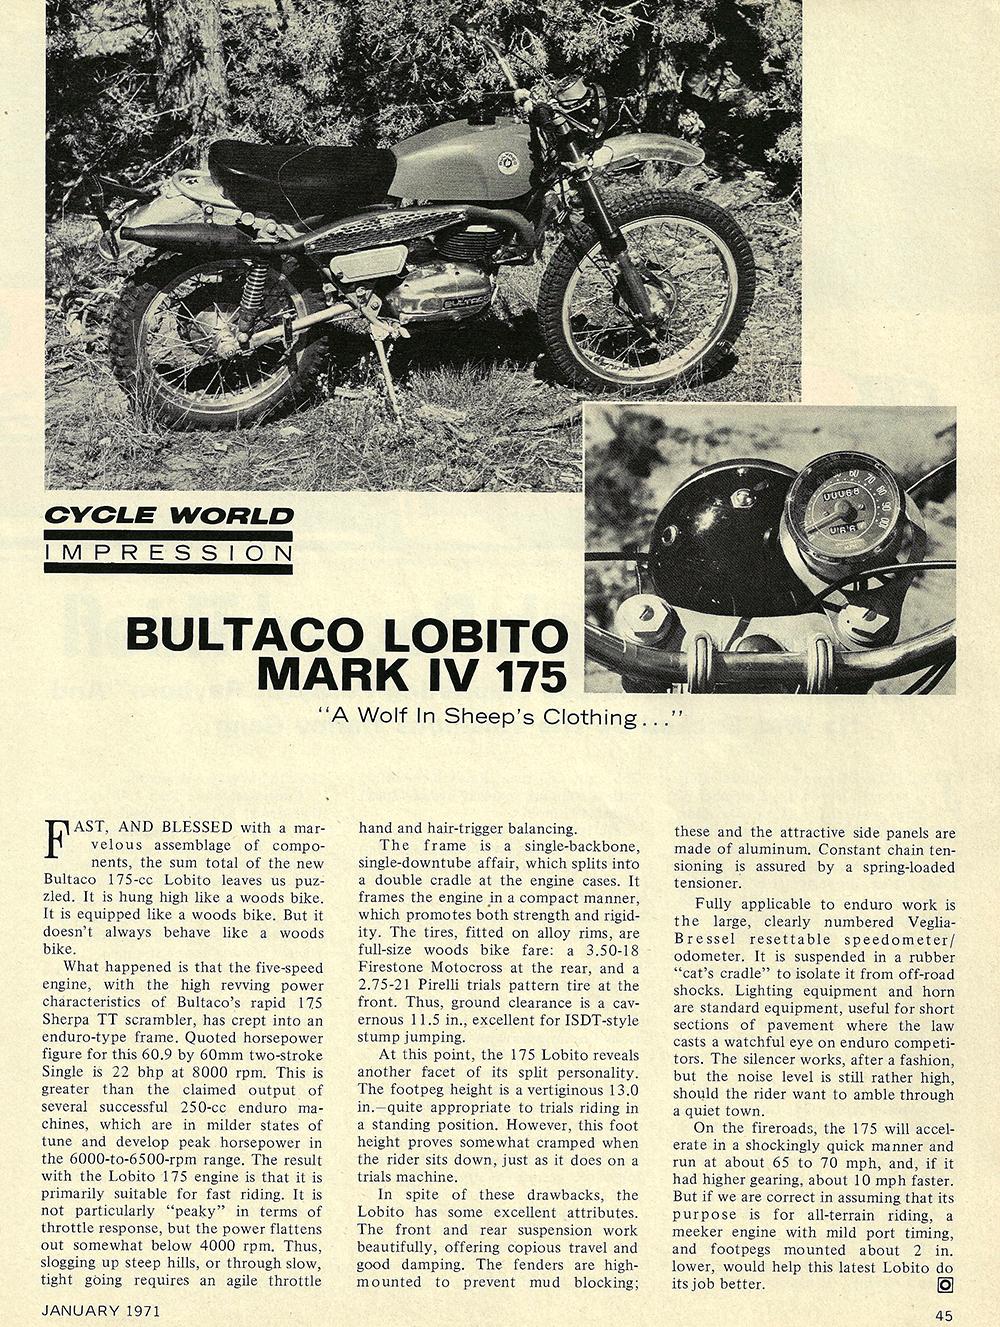 1971 Bultaco Lobito 175 road test 02.jpg